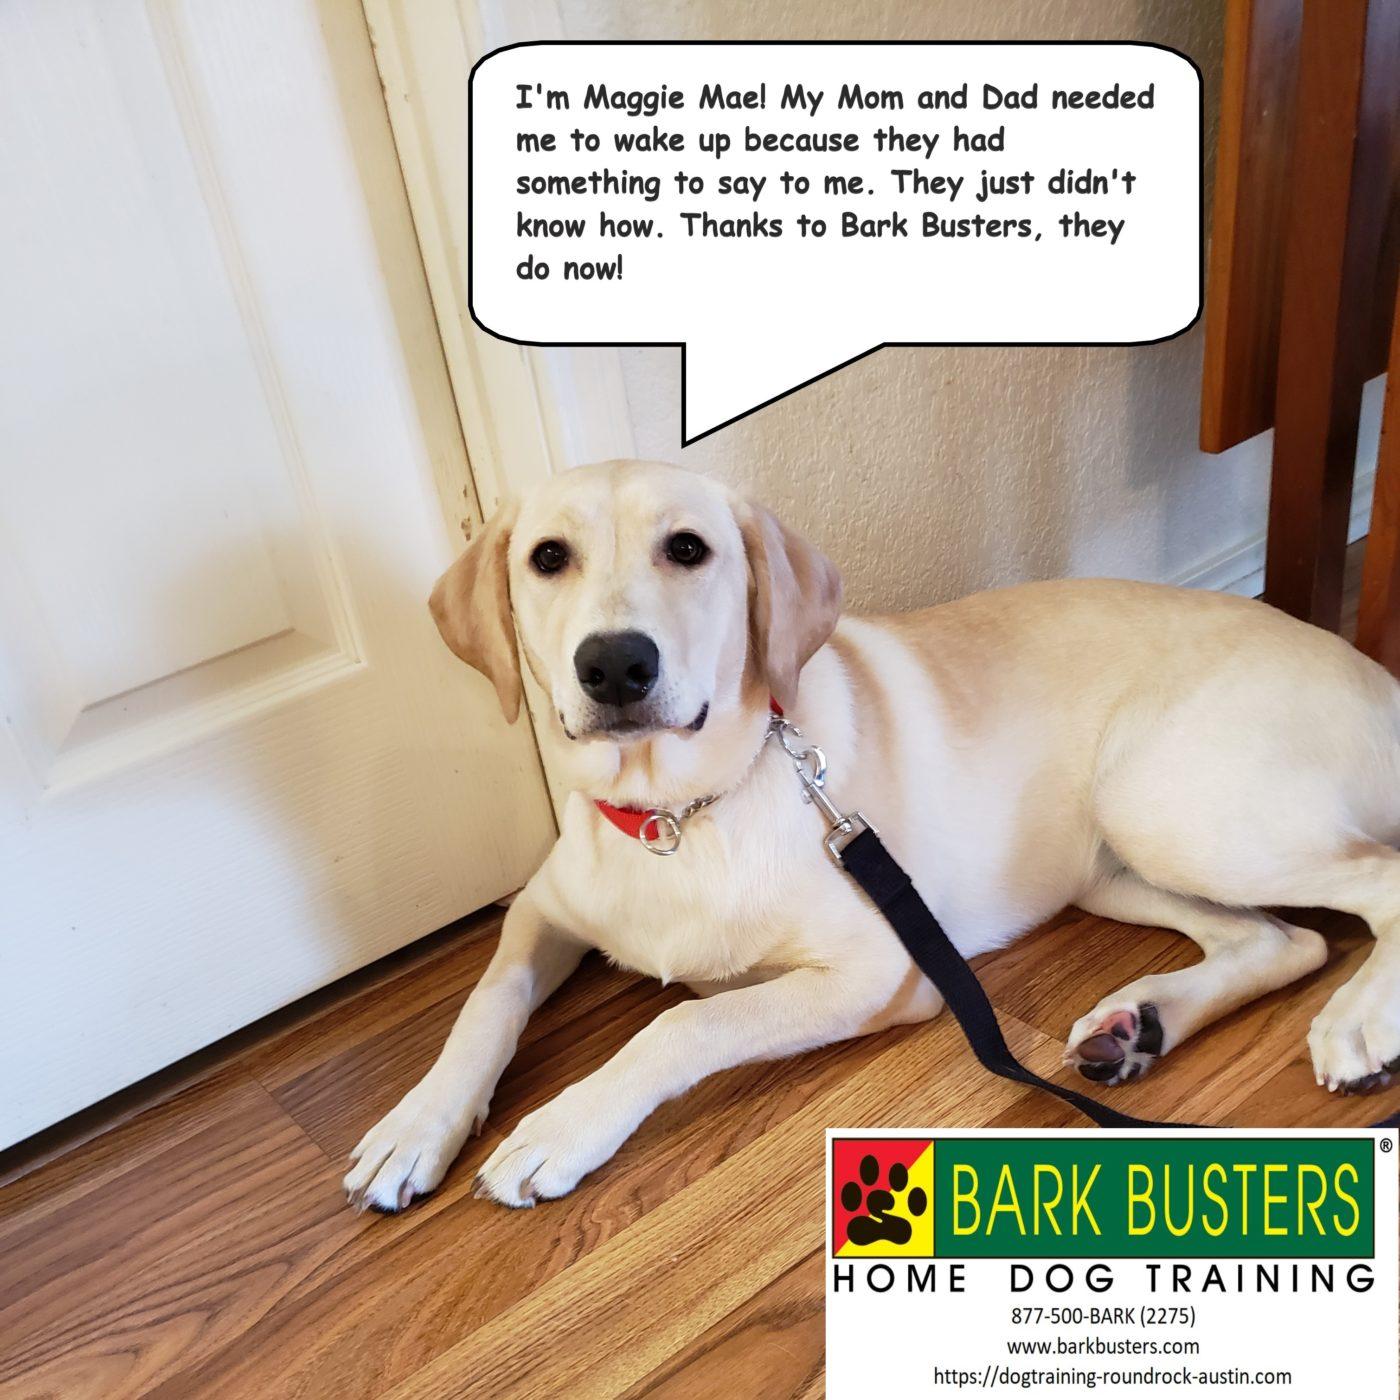 #labradortraining #dogtrainingeastaustin #dogsofbarkbusters #puppytraining #learntospeakdog